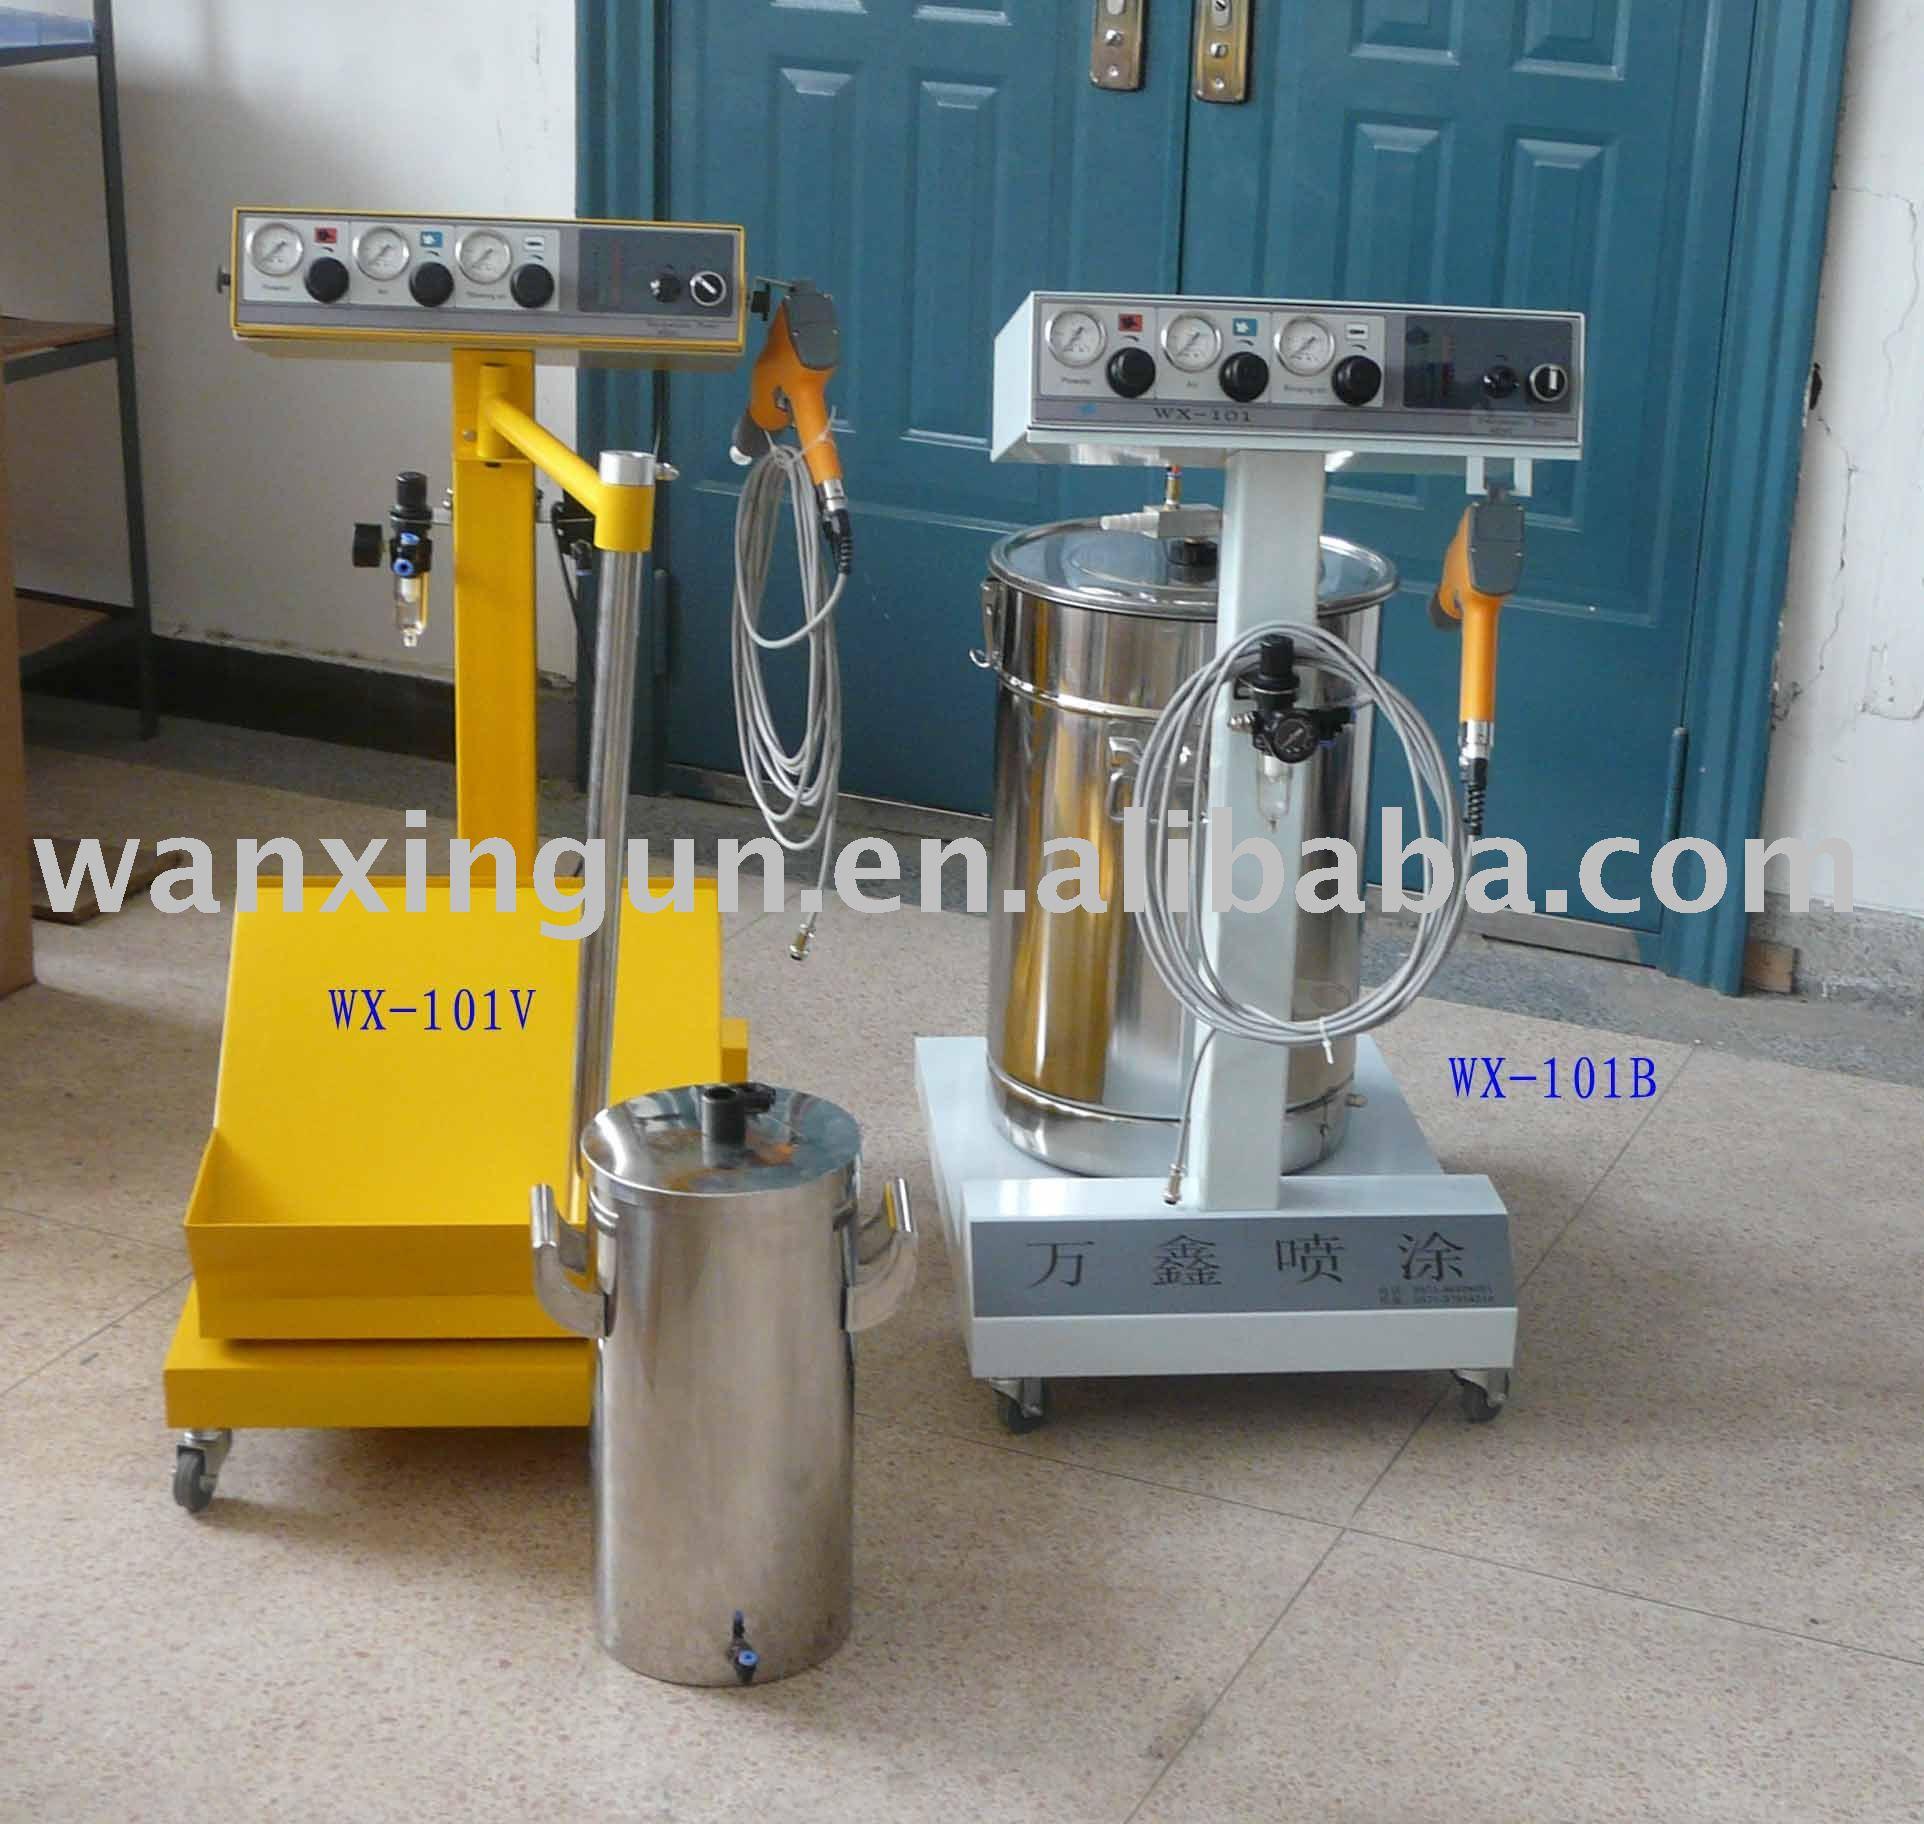 Wanxin Aluminum Epoxy Powder Coating Machine